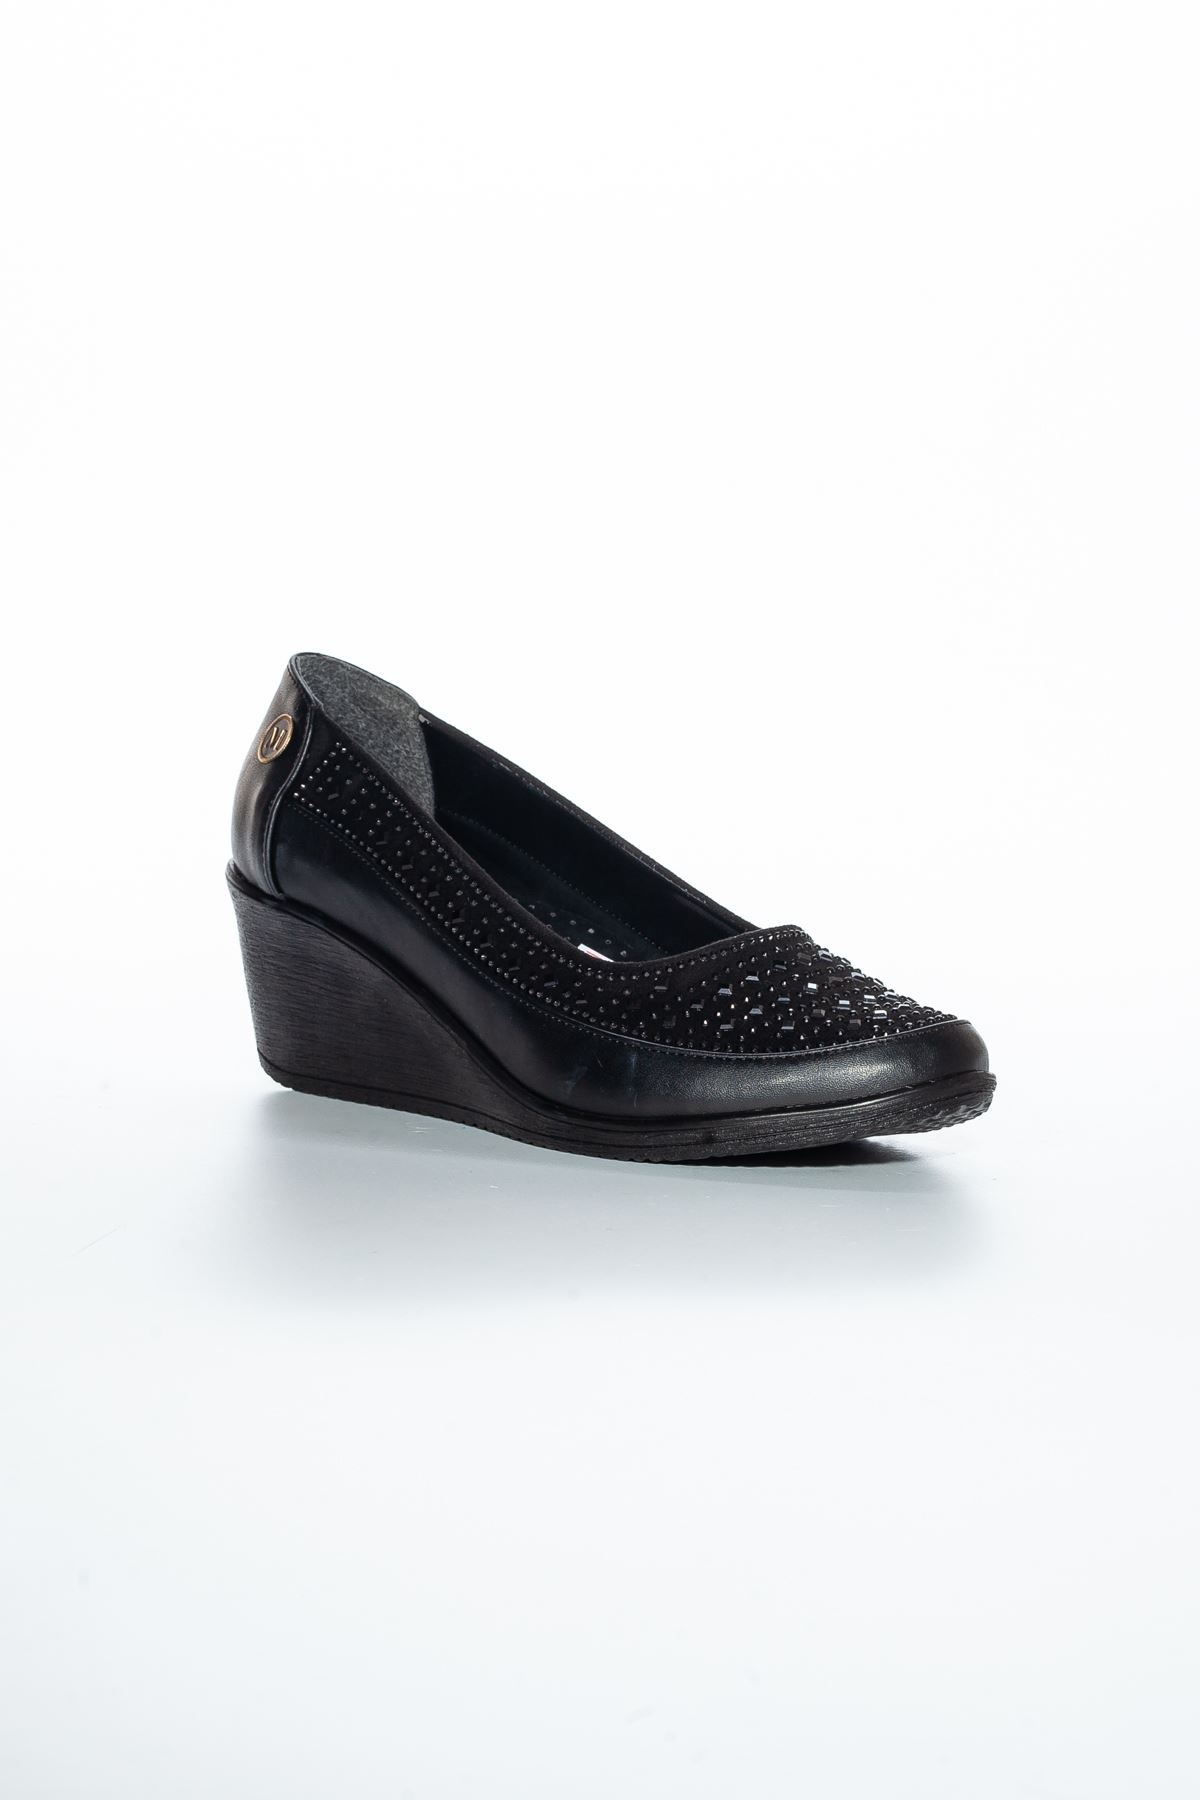 Alza Cilt Ayakkabı Siyah